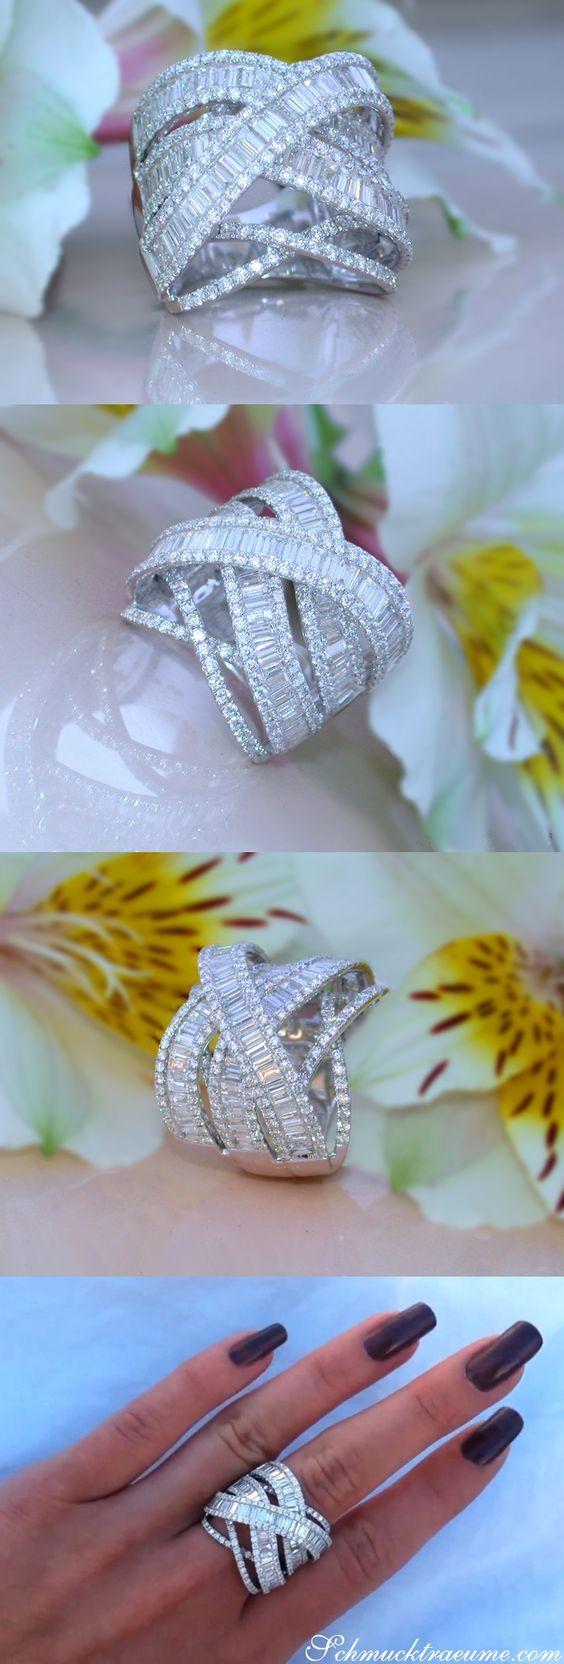 Stunning Crossover Diamond Ring   4.73 ct. G VS1   Whitegold 18k – schmucktraeume.com Like: www.facebook.com/…